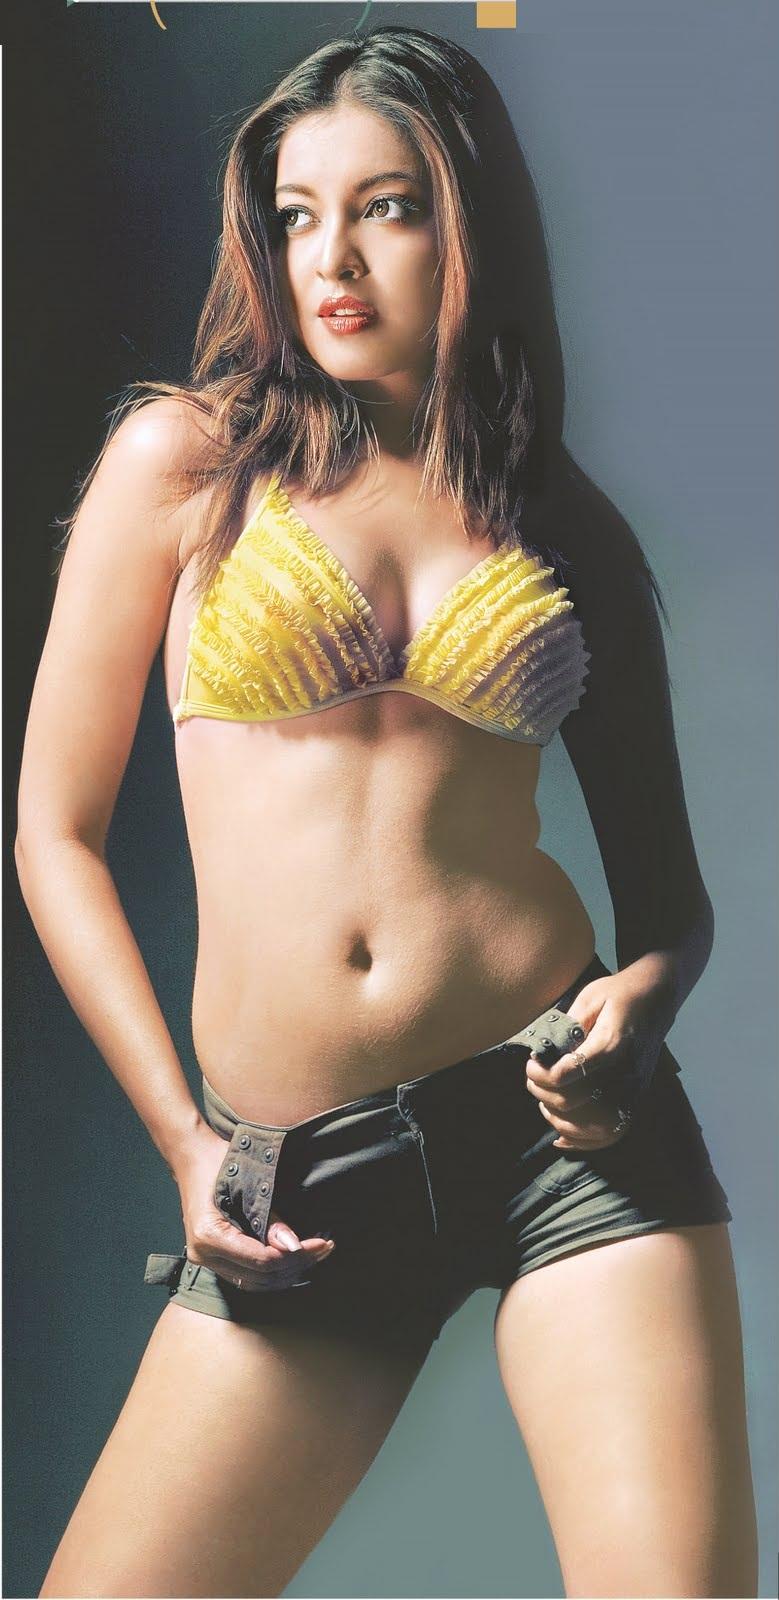 Bikini Model In The World: Tanushree Dutta Hot in Bikini ...